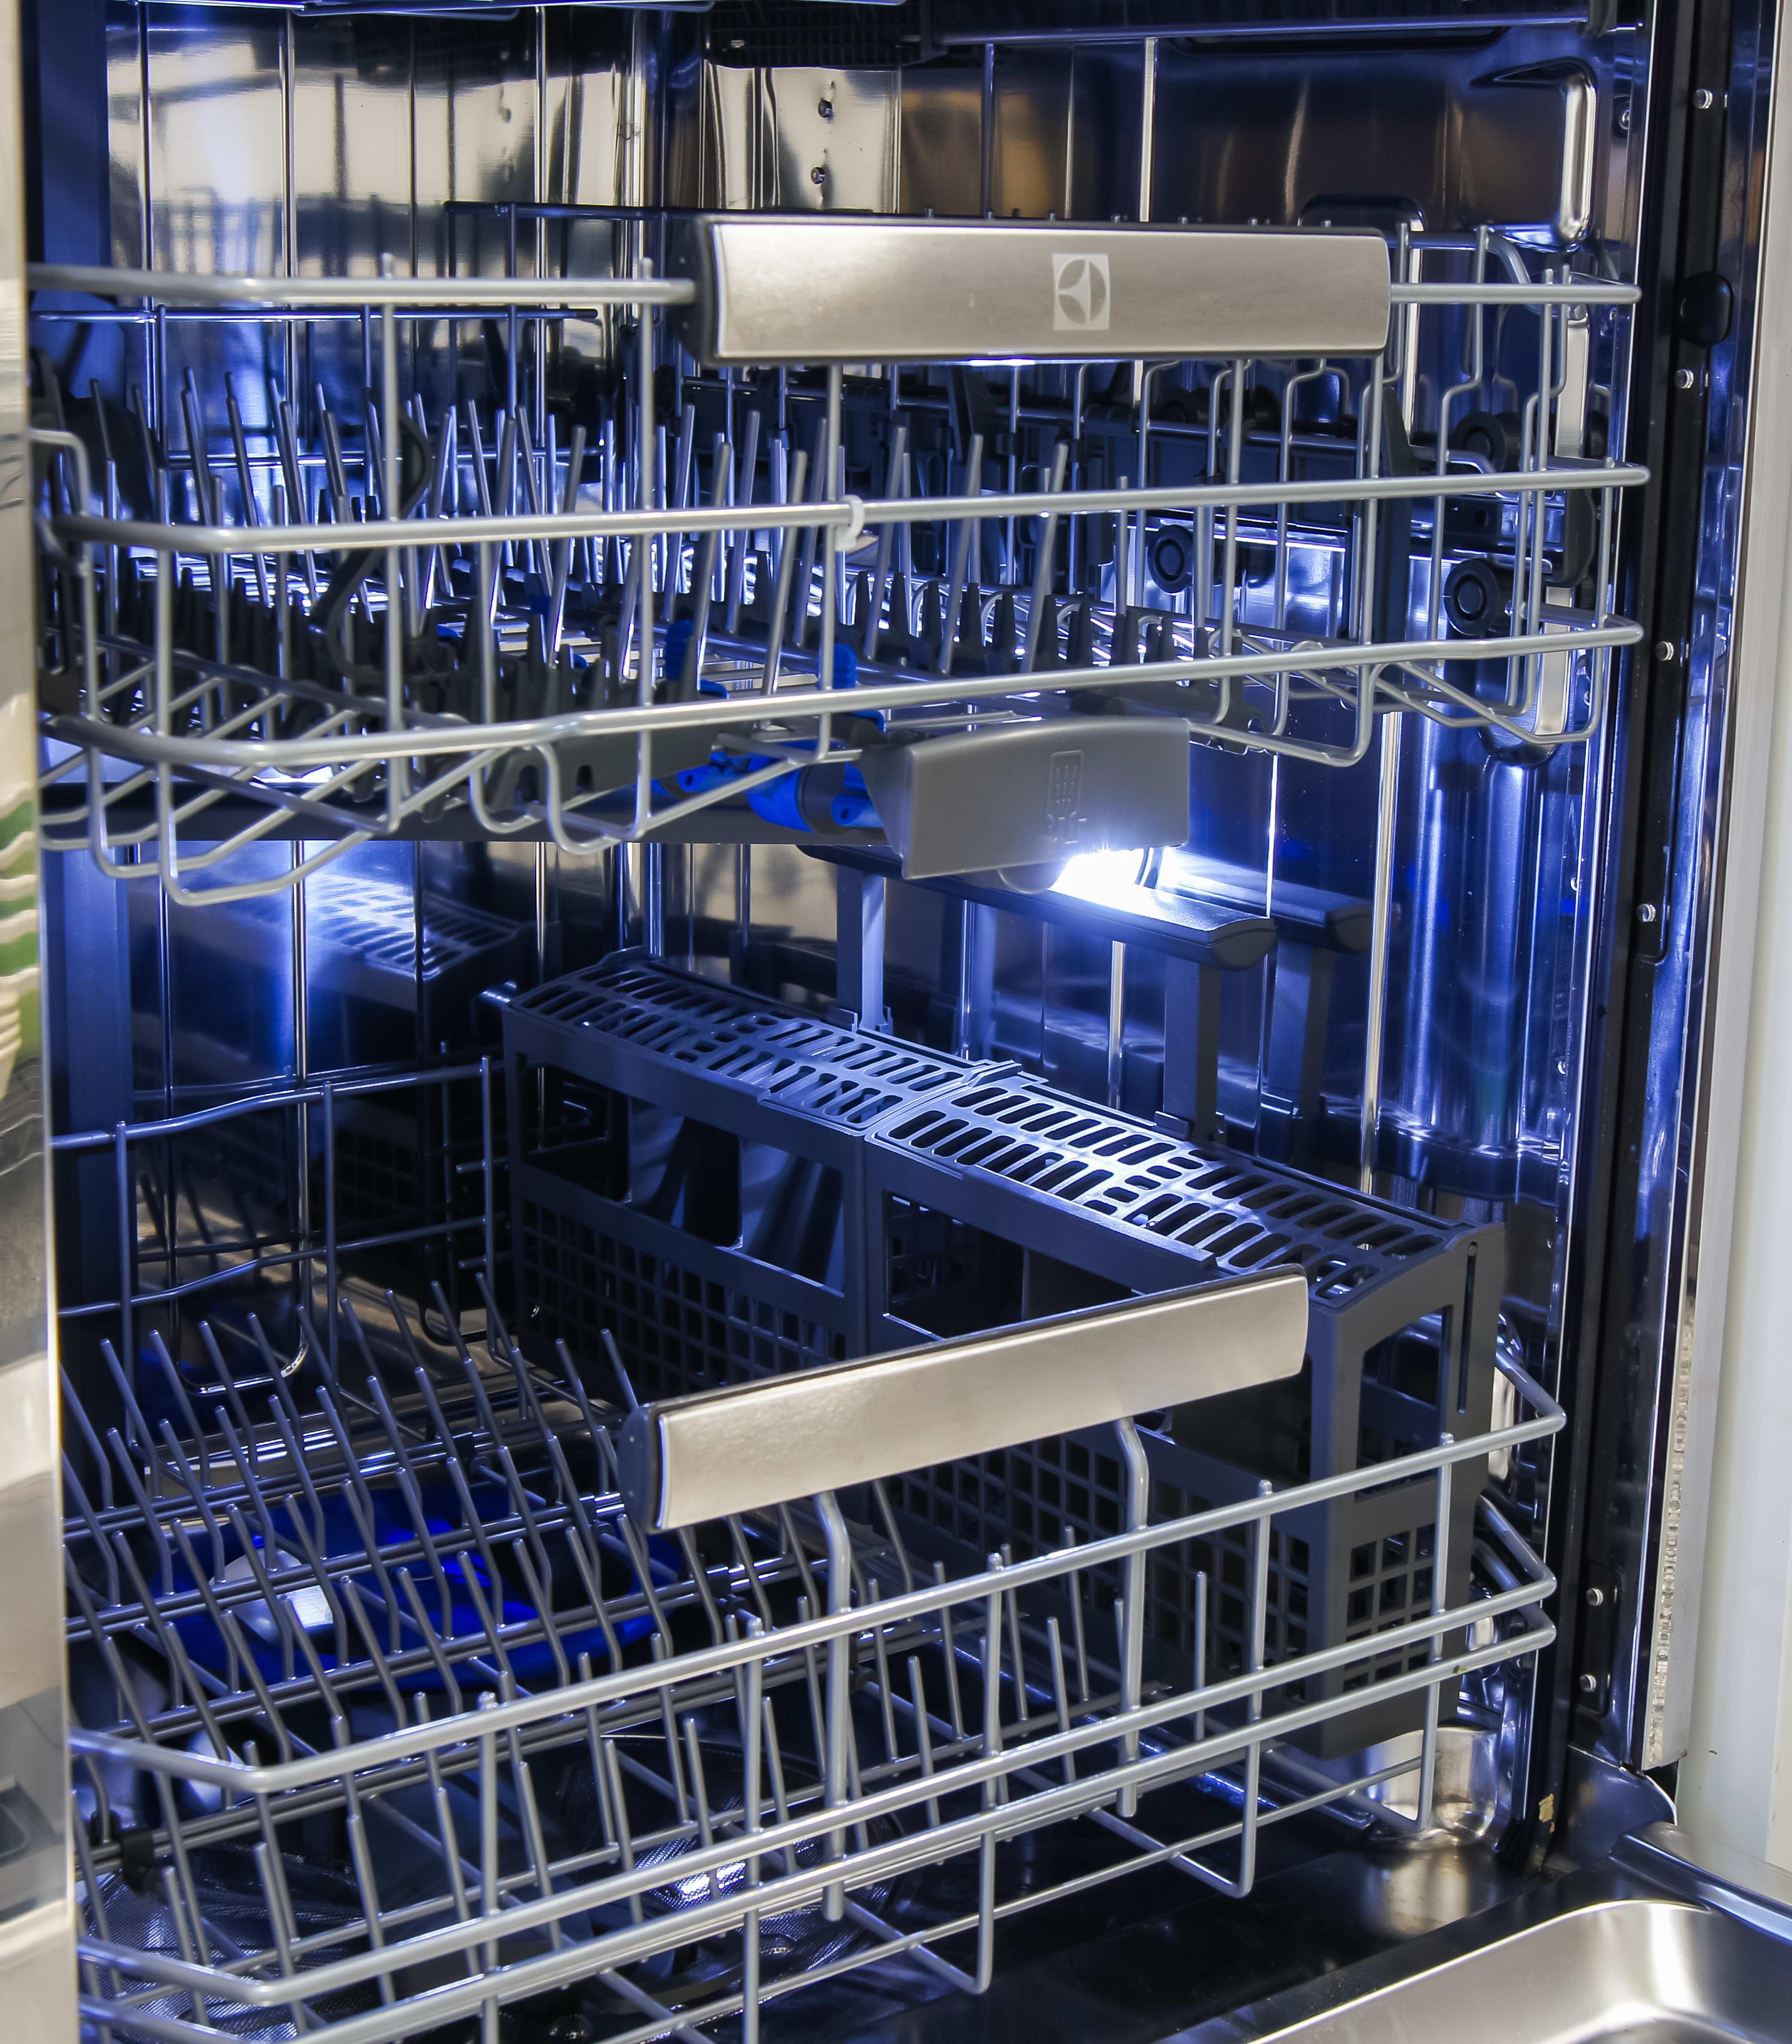 Electrolux EI24ID50QS internal light